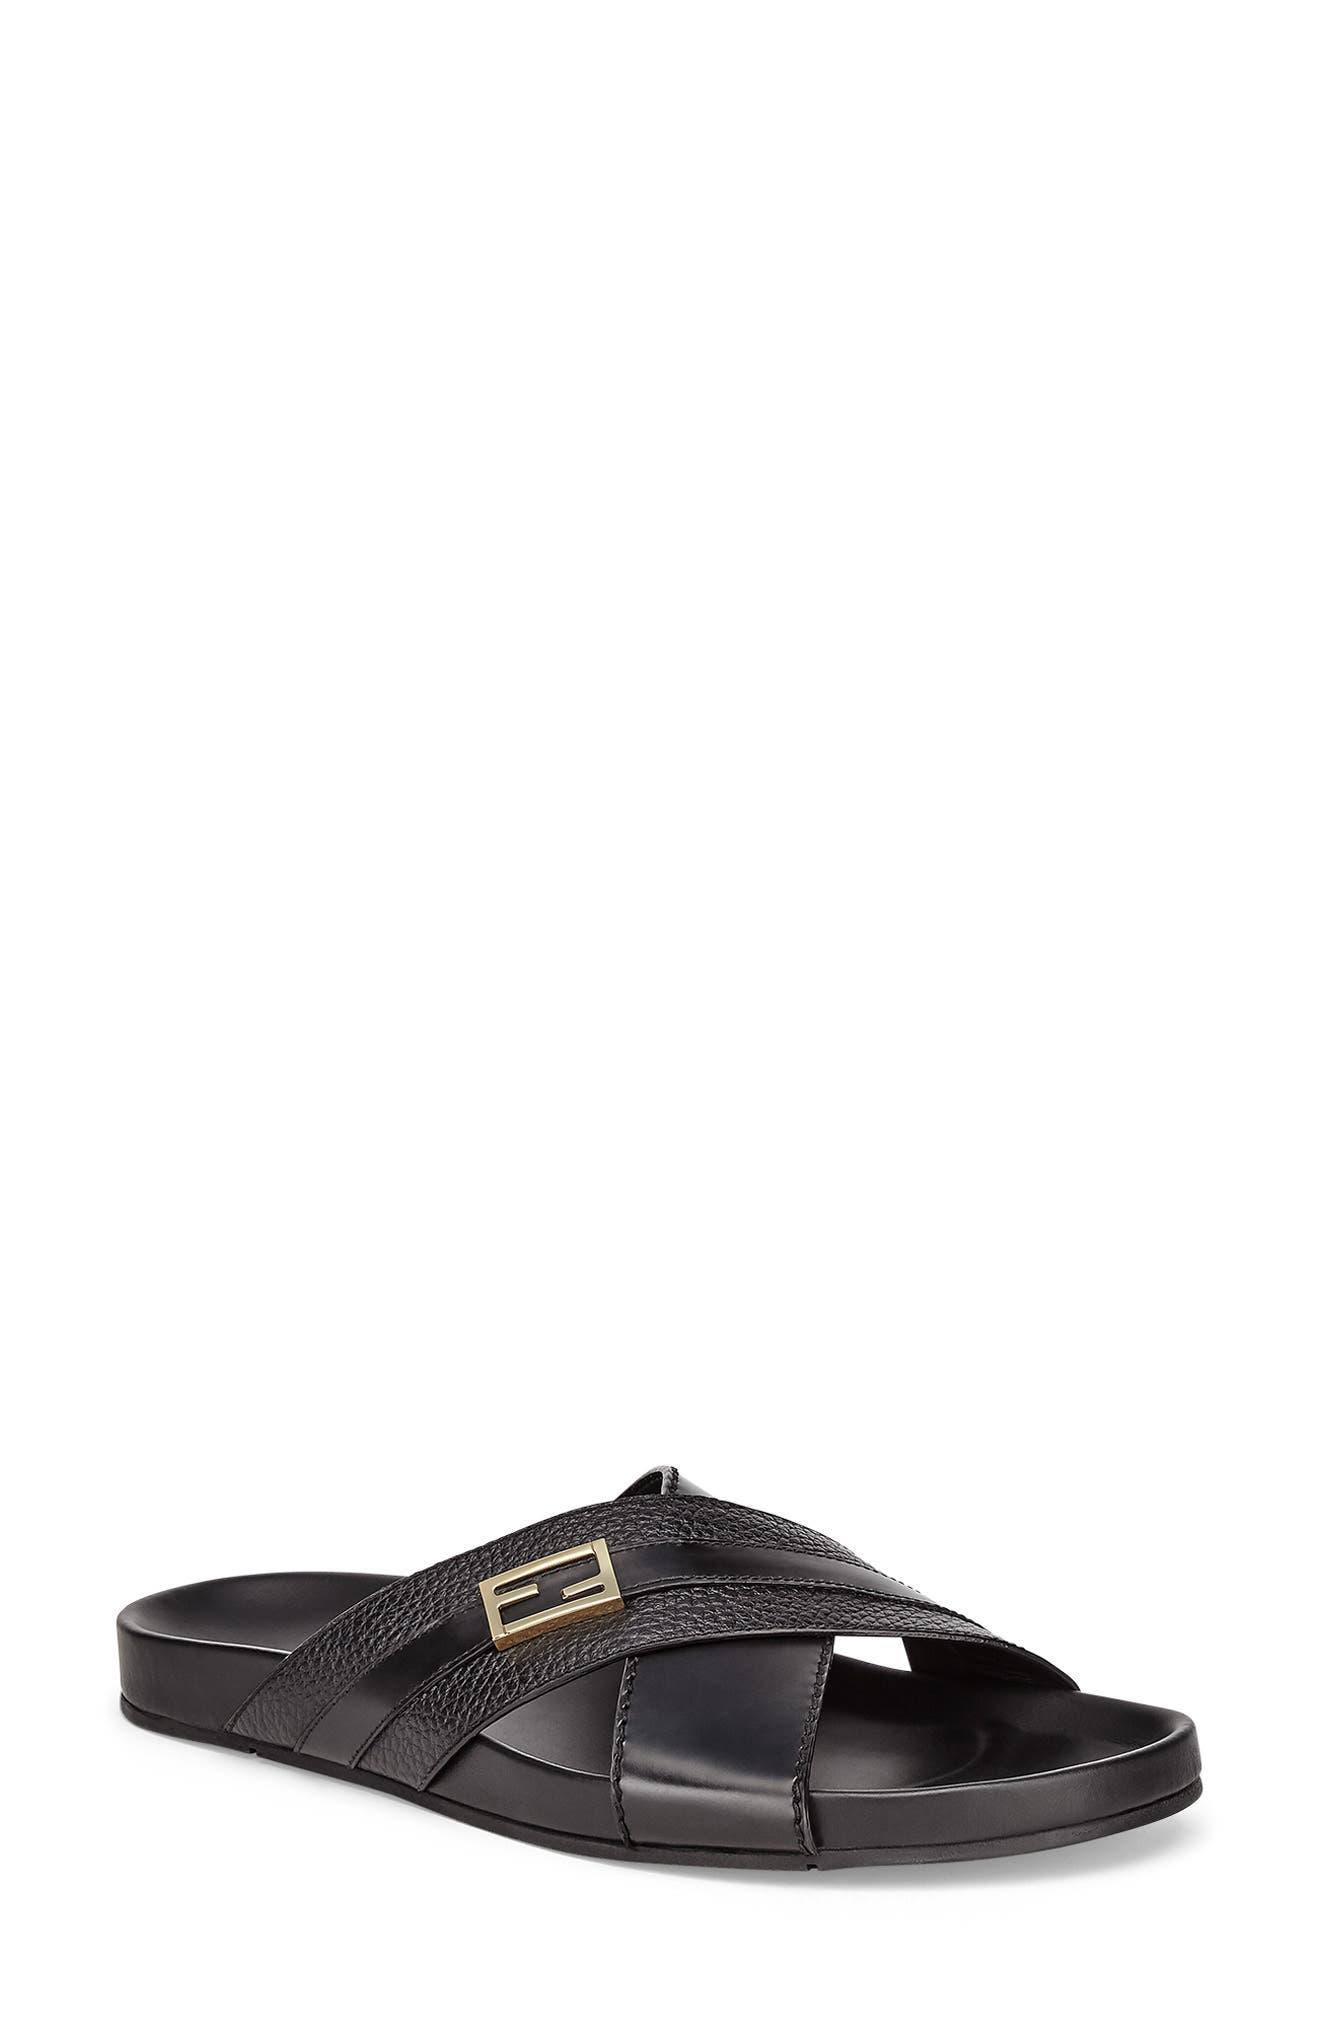 Men's Fendi Sandals, Slides \u0026 Flip